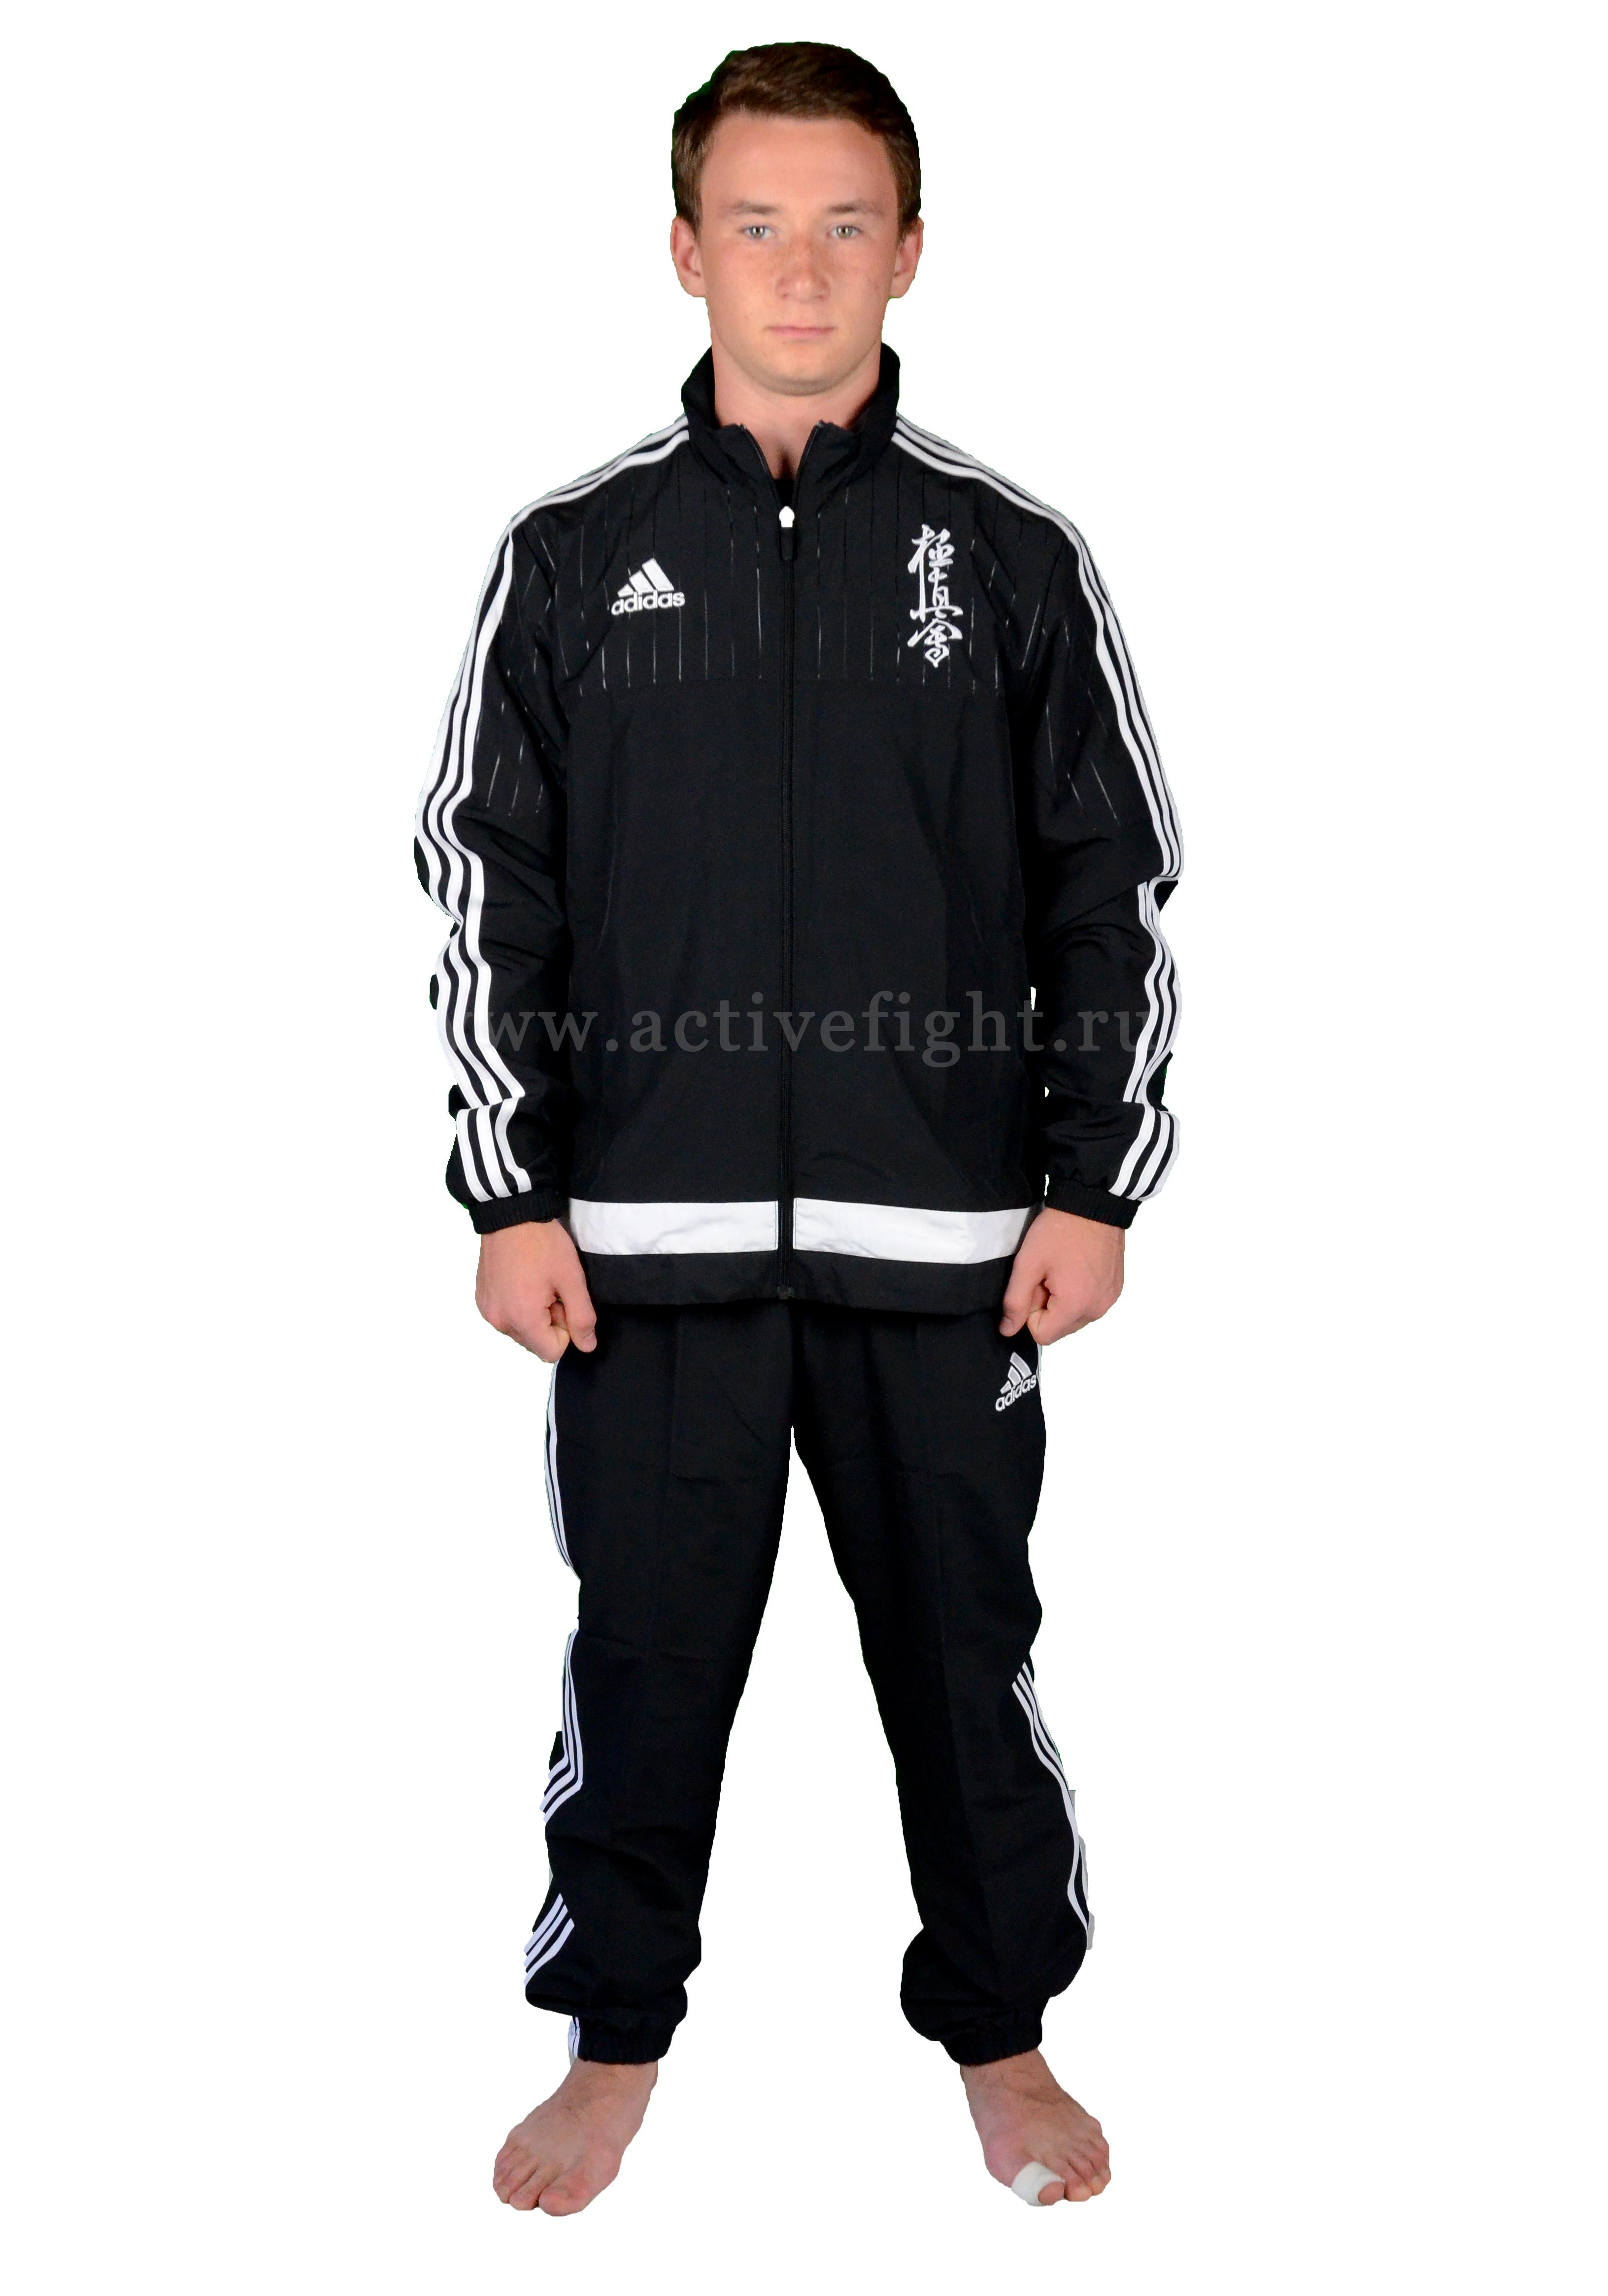 f00d8383 Спортивный костюм Adidas